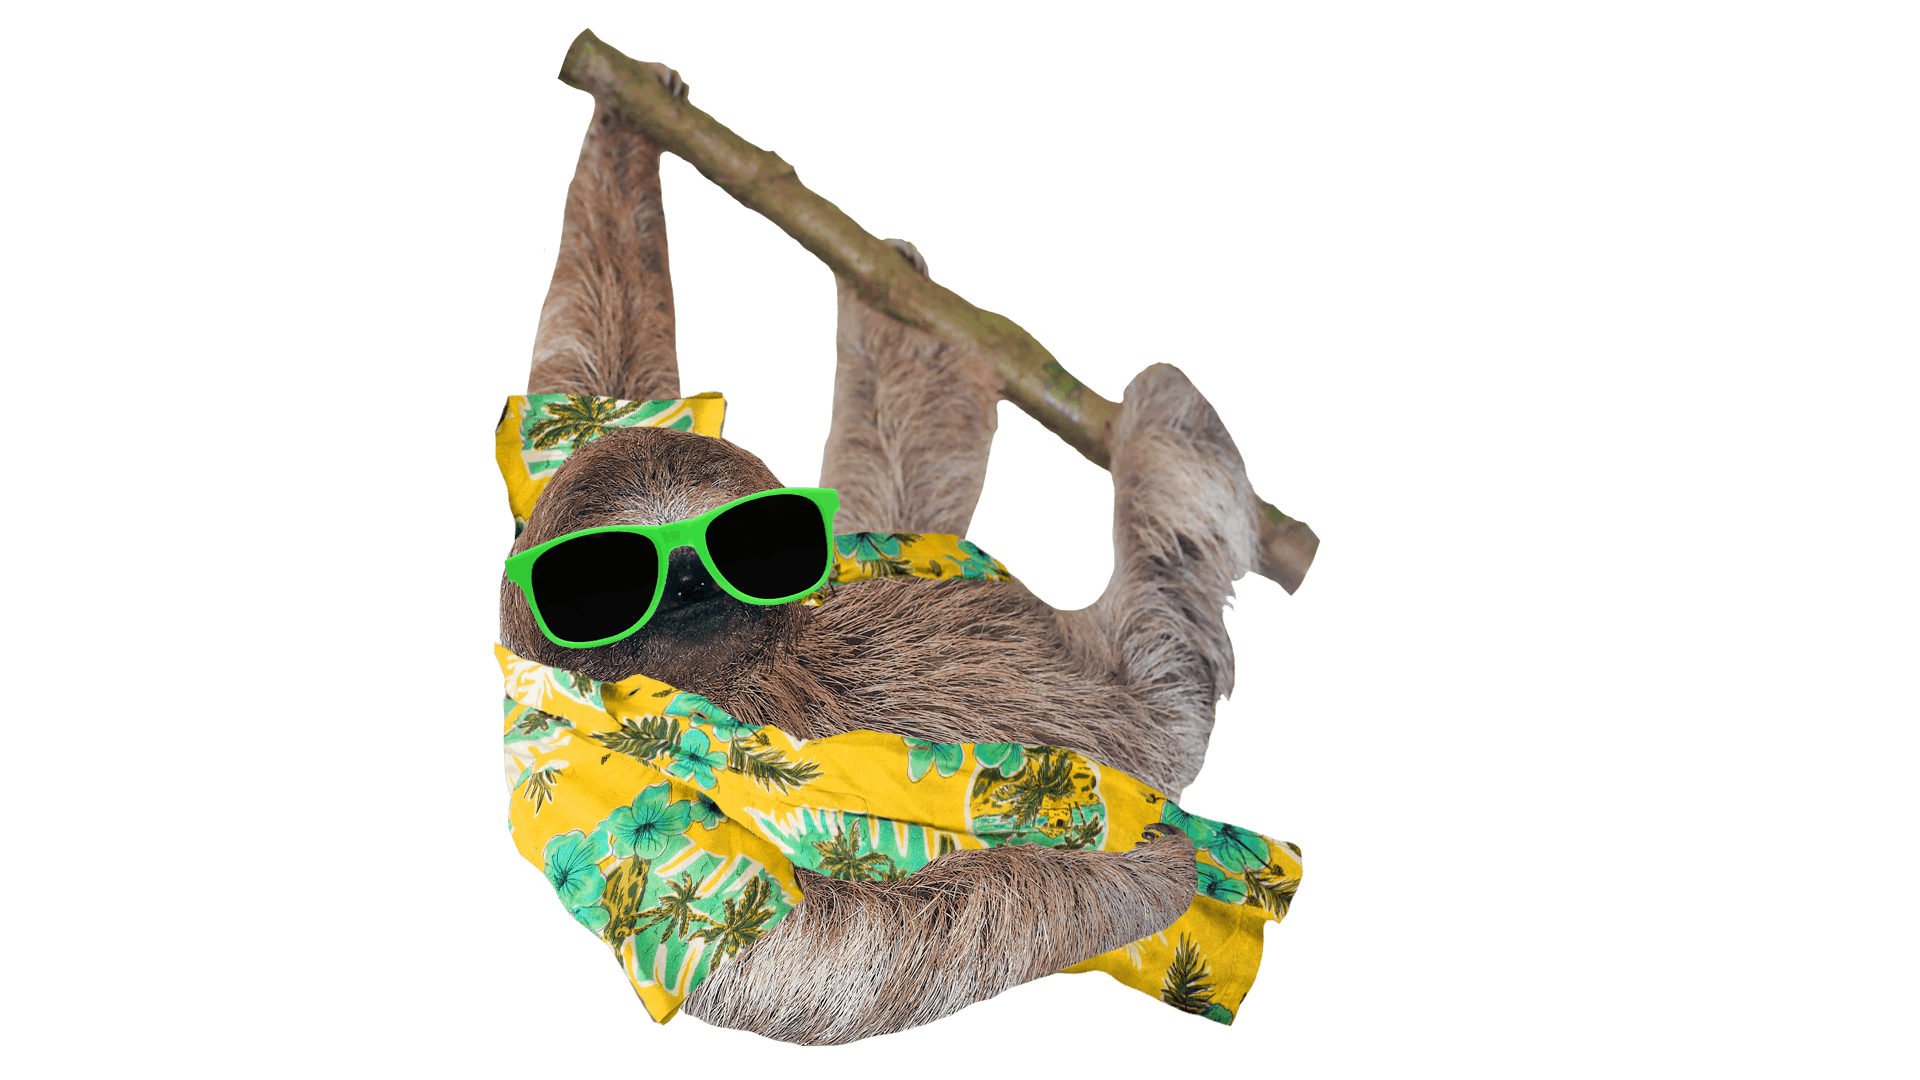 Sloth in a shades and a holiday shirt